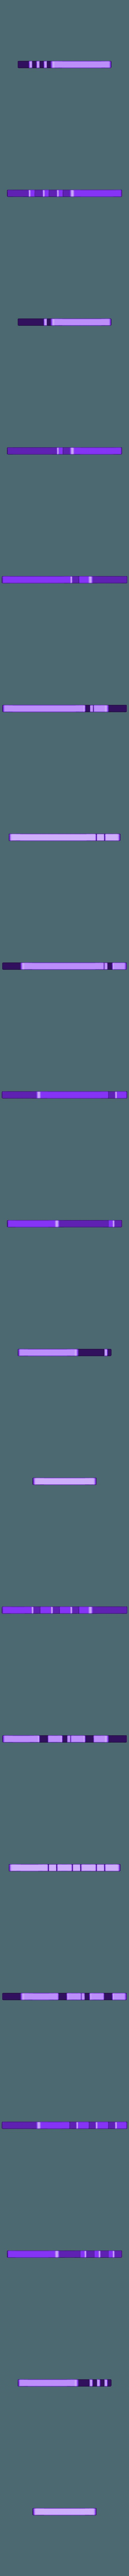 part2x1.stl Download free STL file The lattice puzzle • 3D printing object, dancingchicken